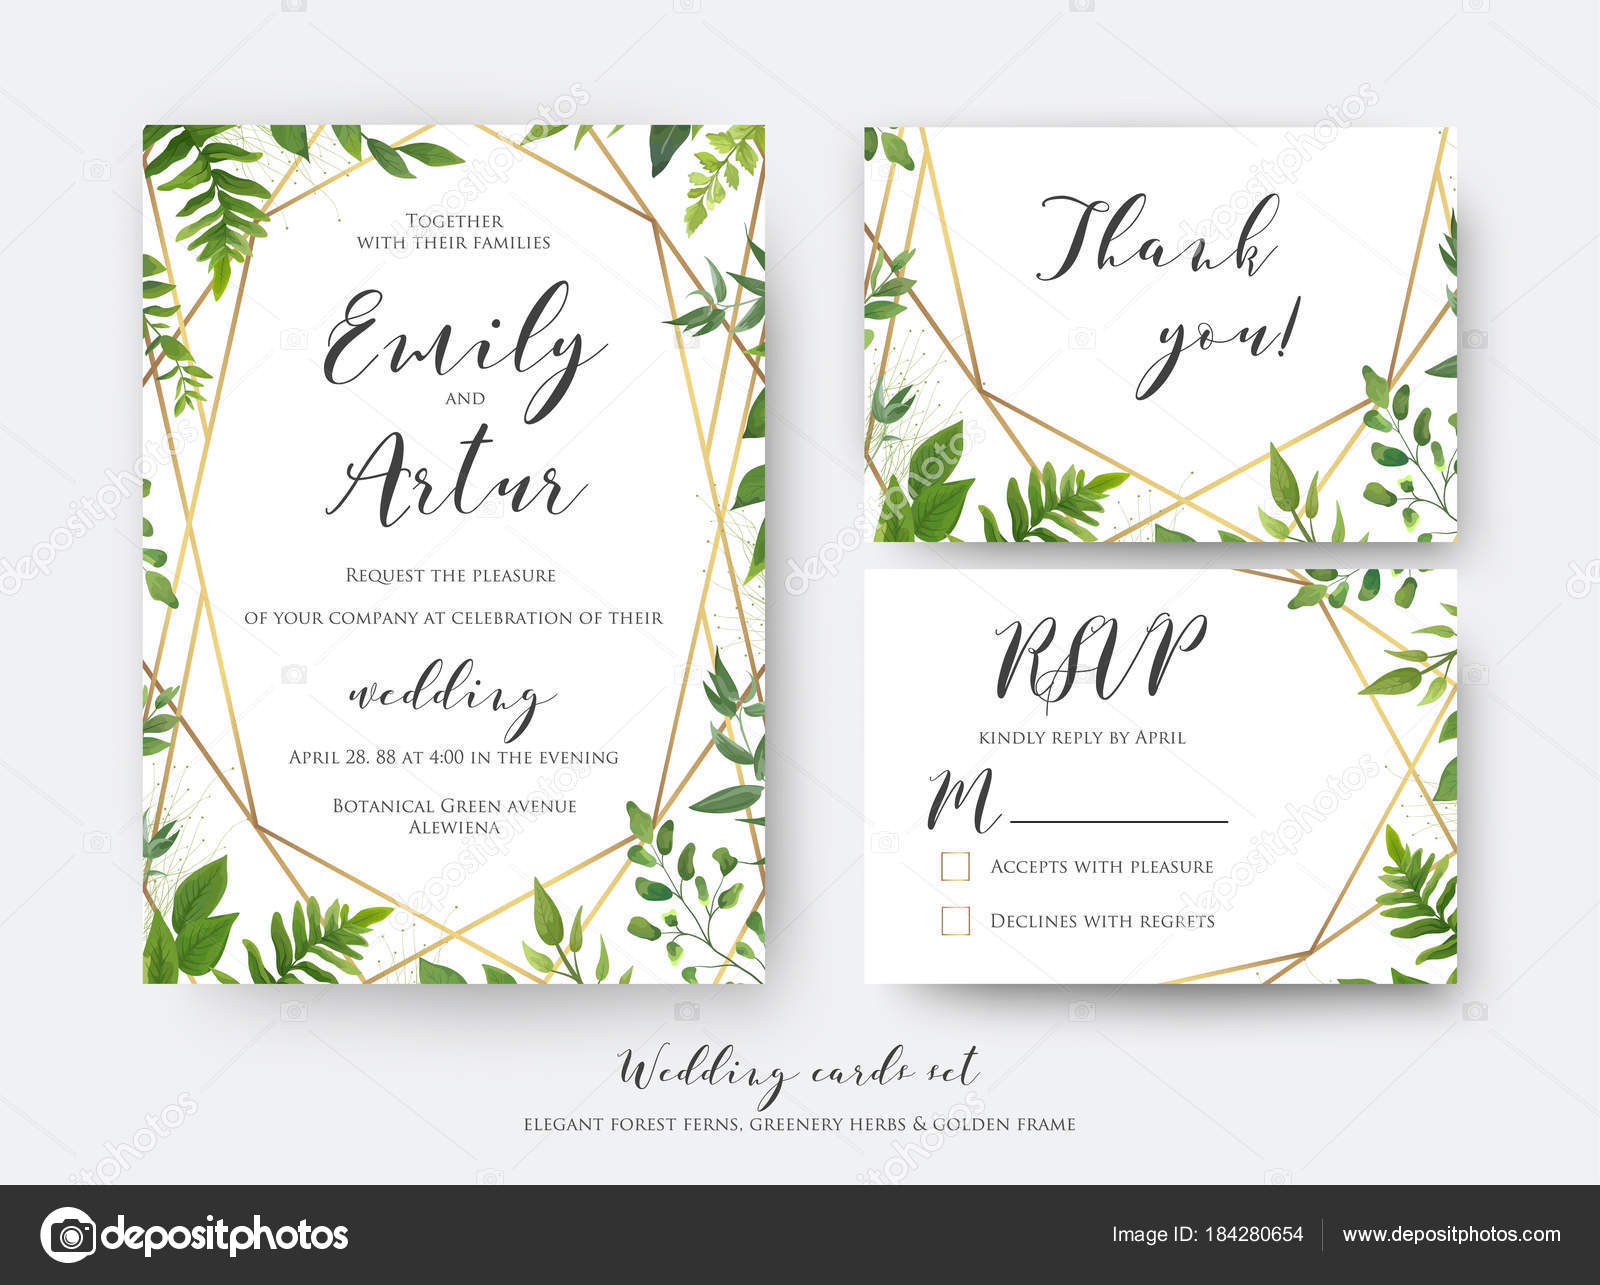 wedding floral invite invitation rsvp thank you card template set